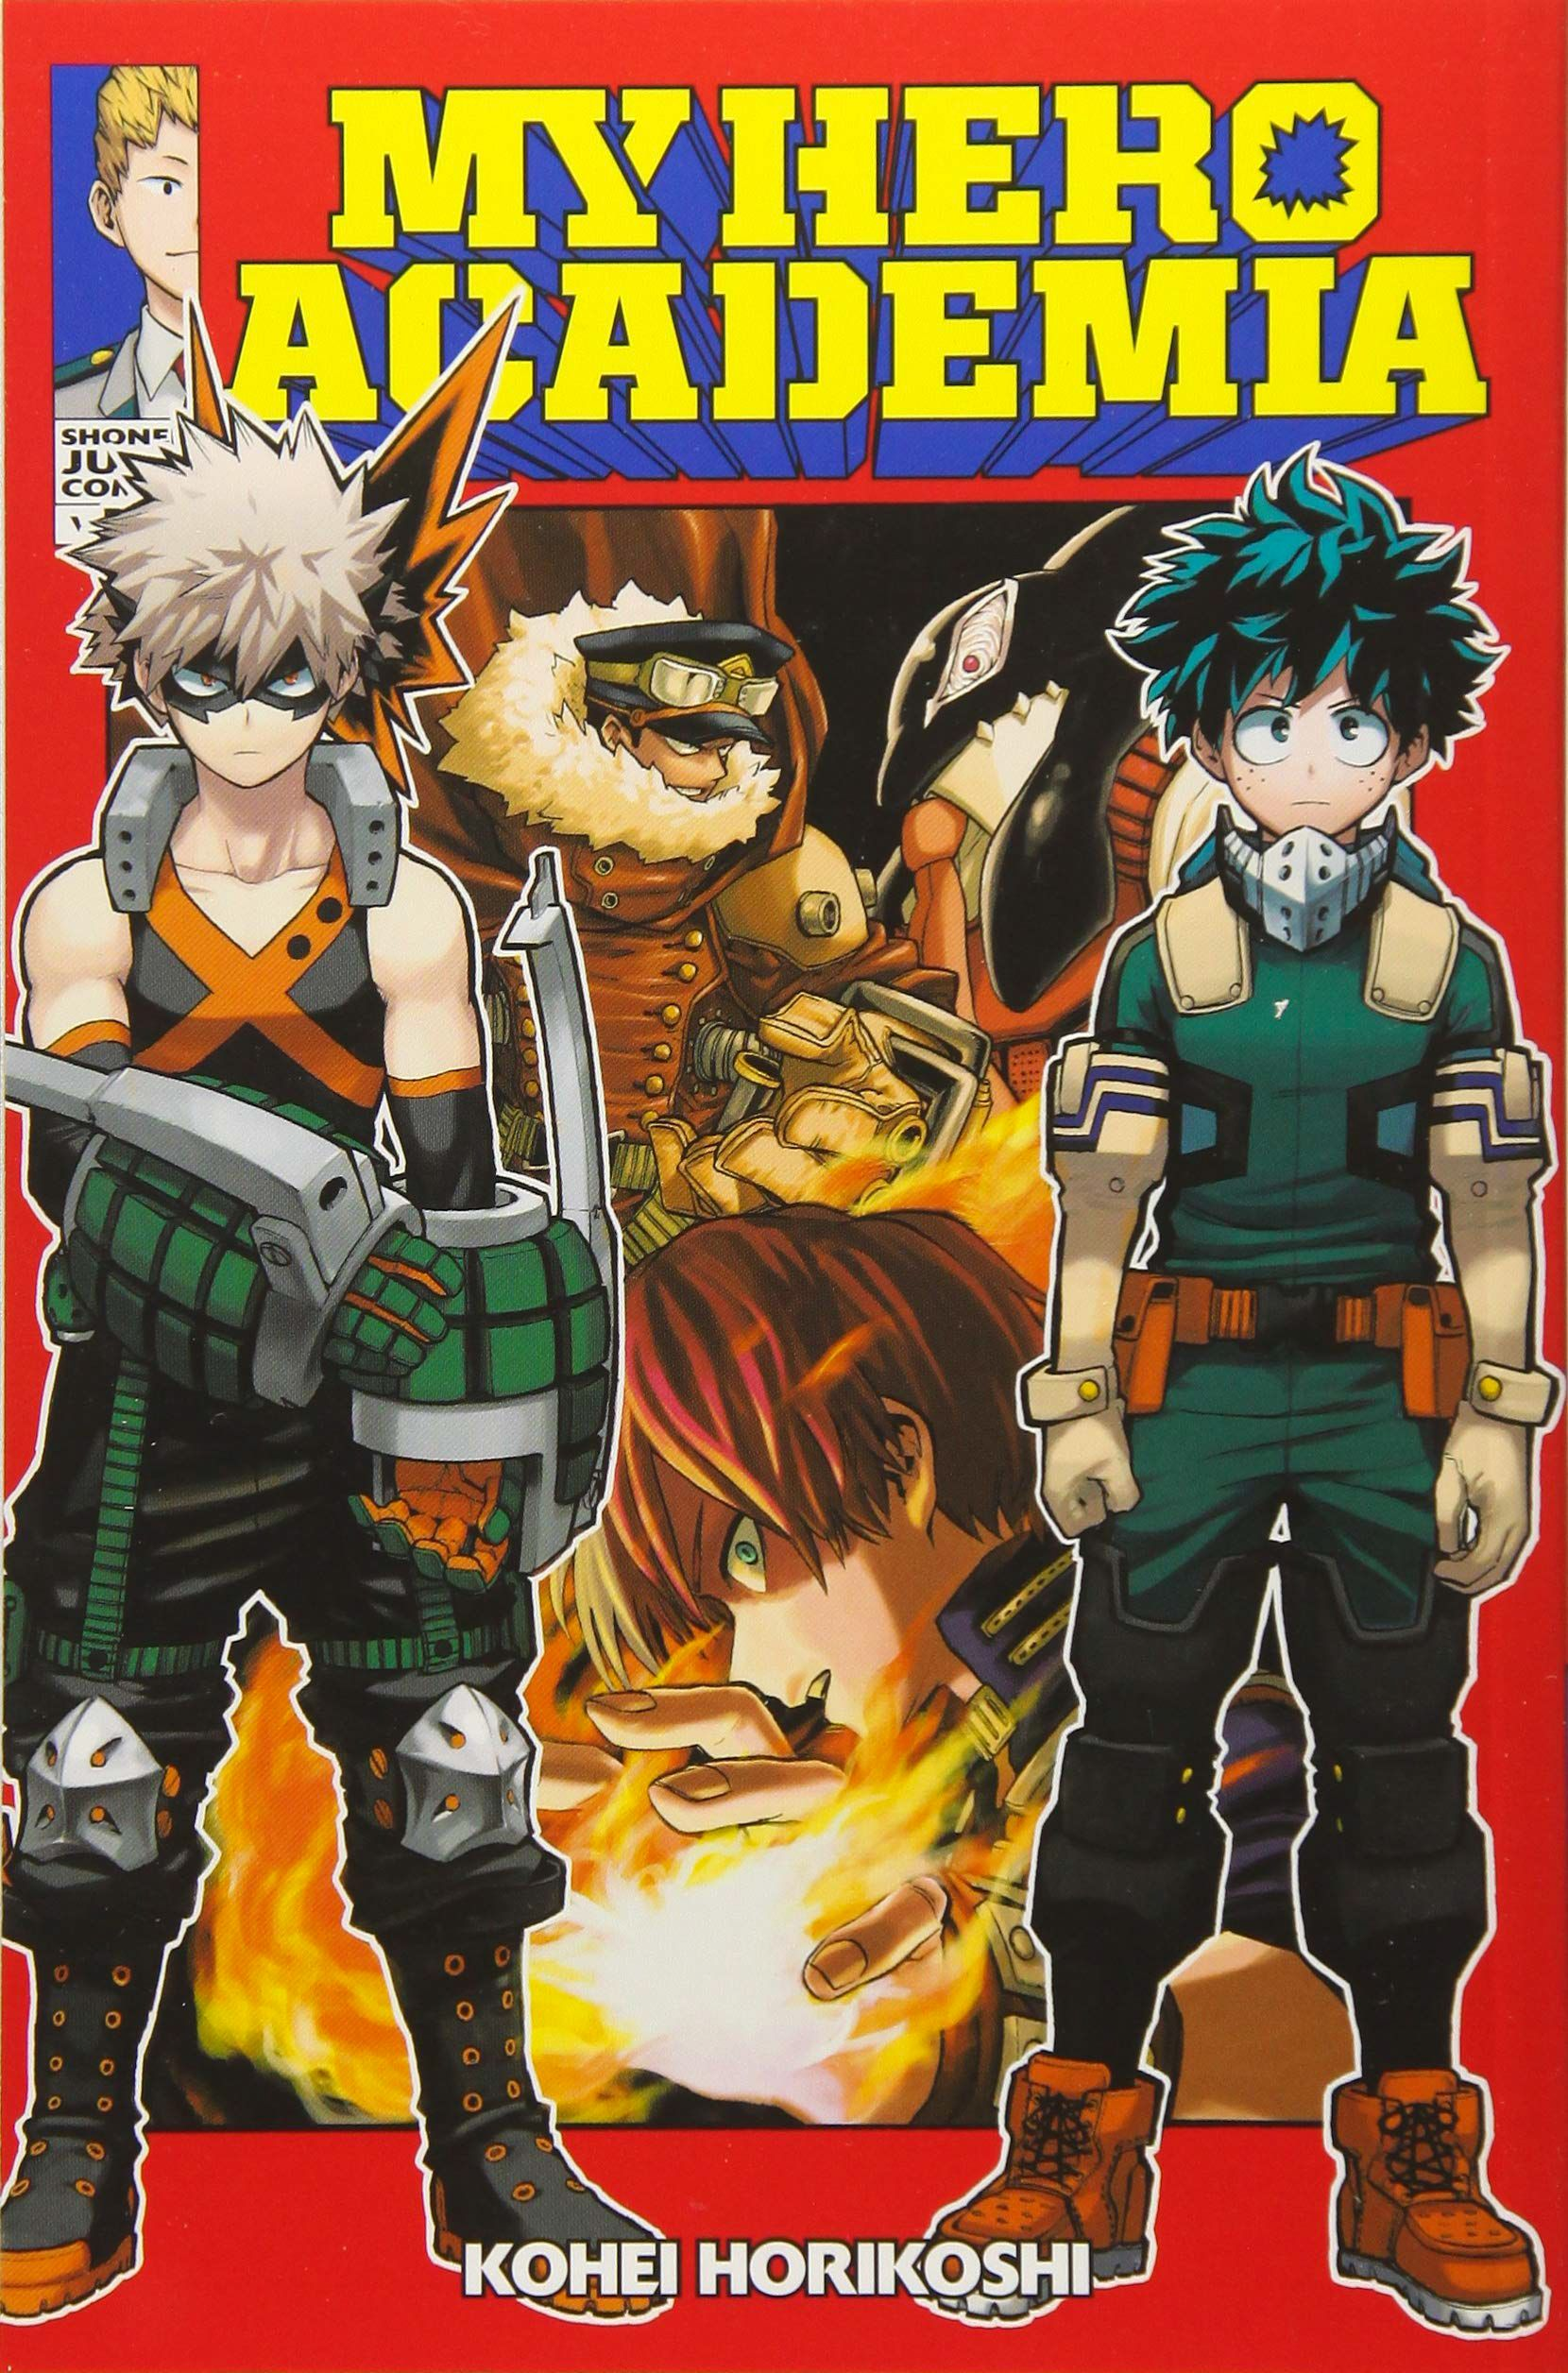 My Hero Academia Gghimself Anime Manga Touch Picture To Buy It Gg In 2020 Books My Hero Academia My Hero